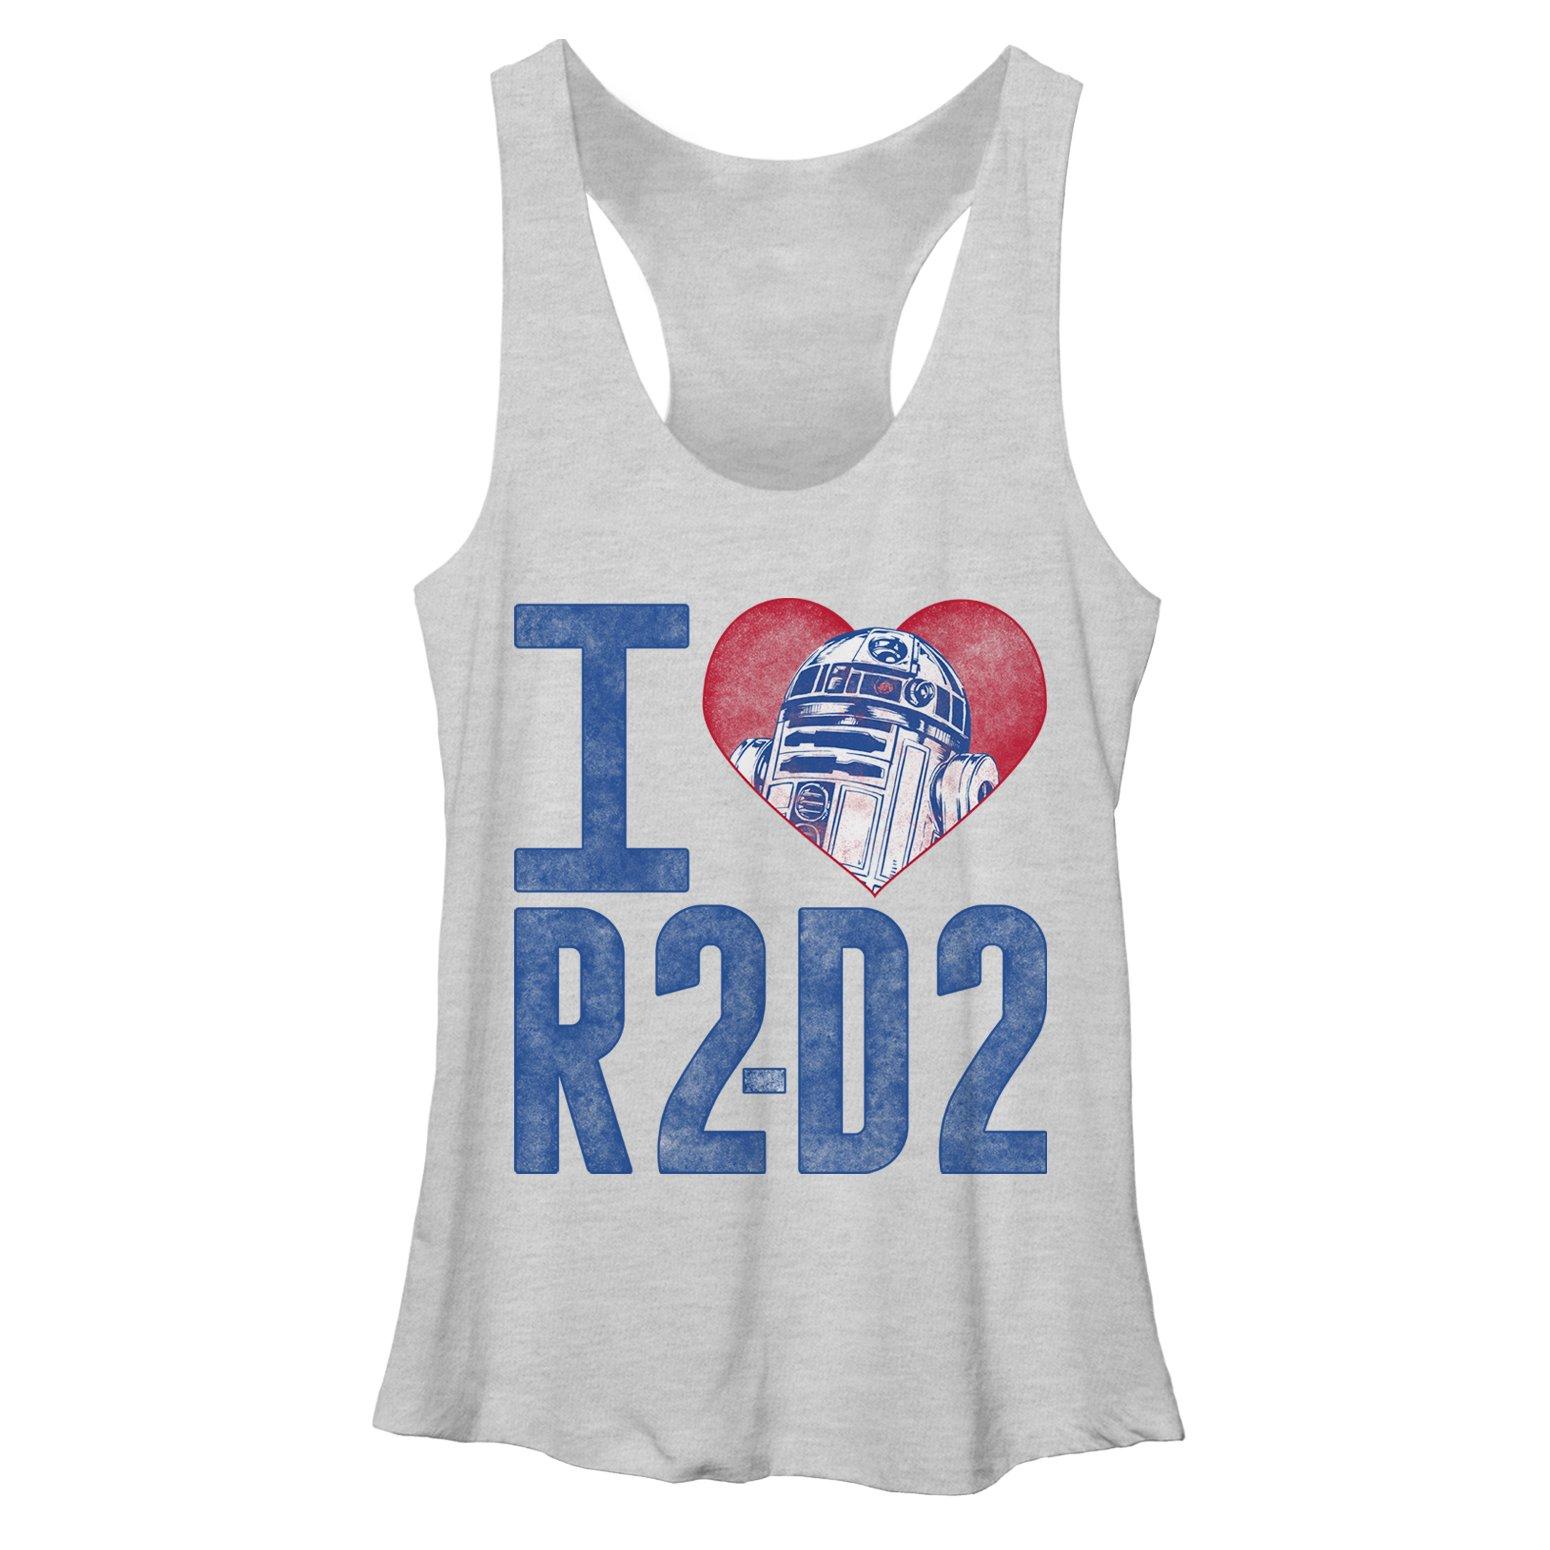 Star Wars Women's I Love R2D2 White Heather Racerback Tank Top